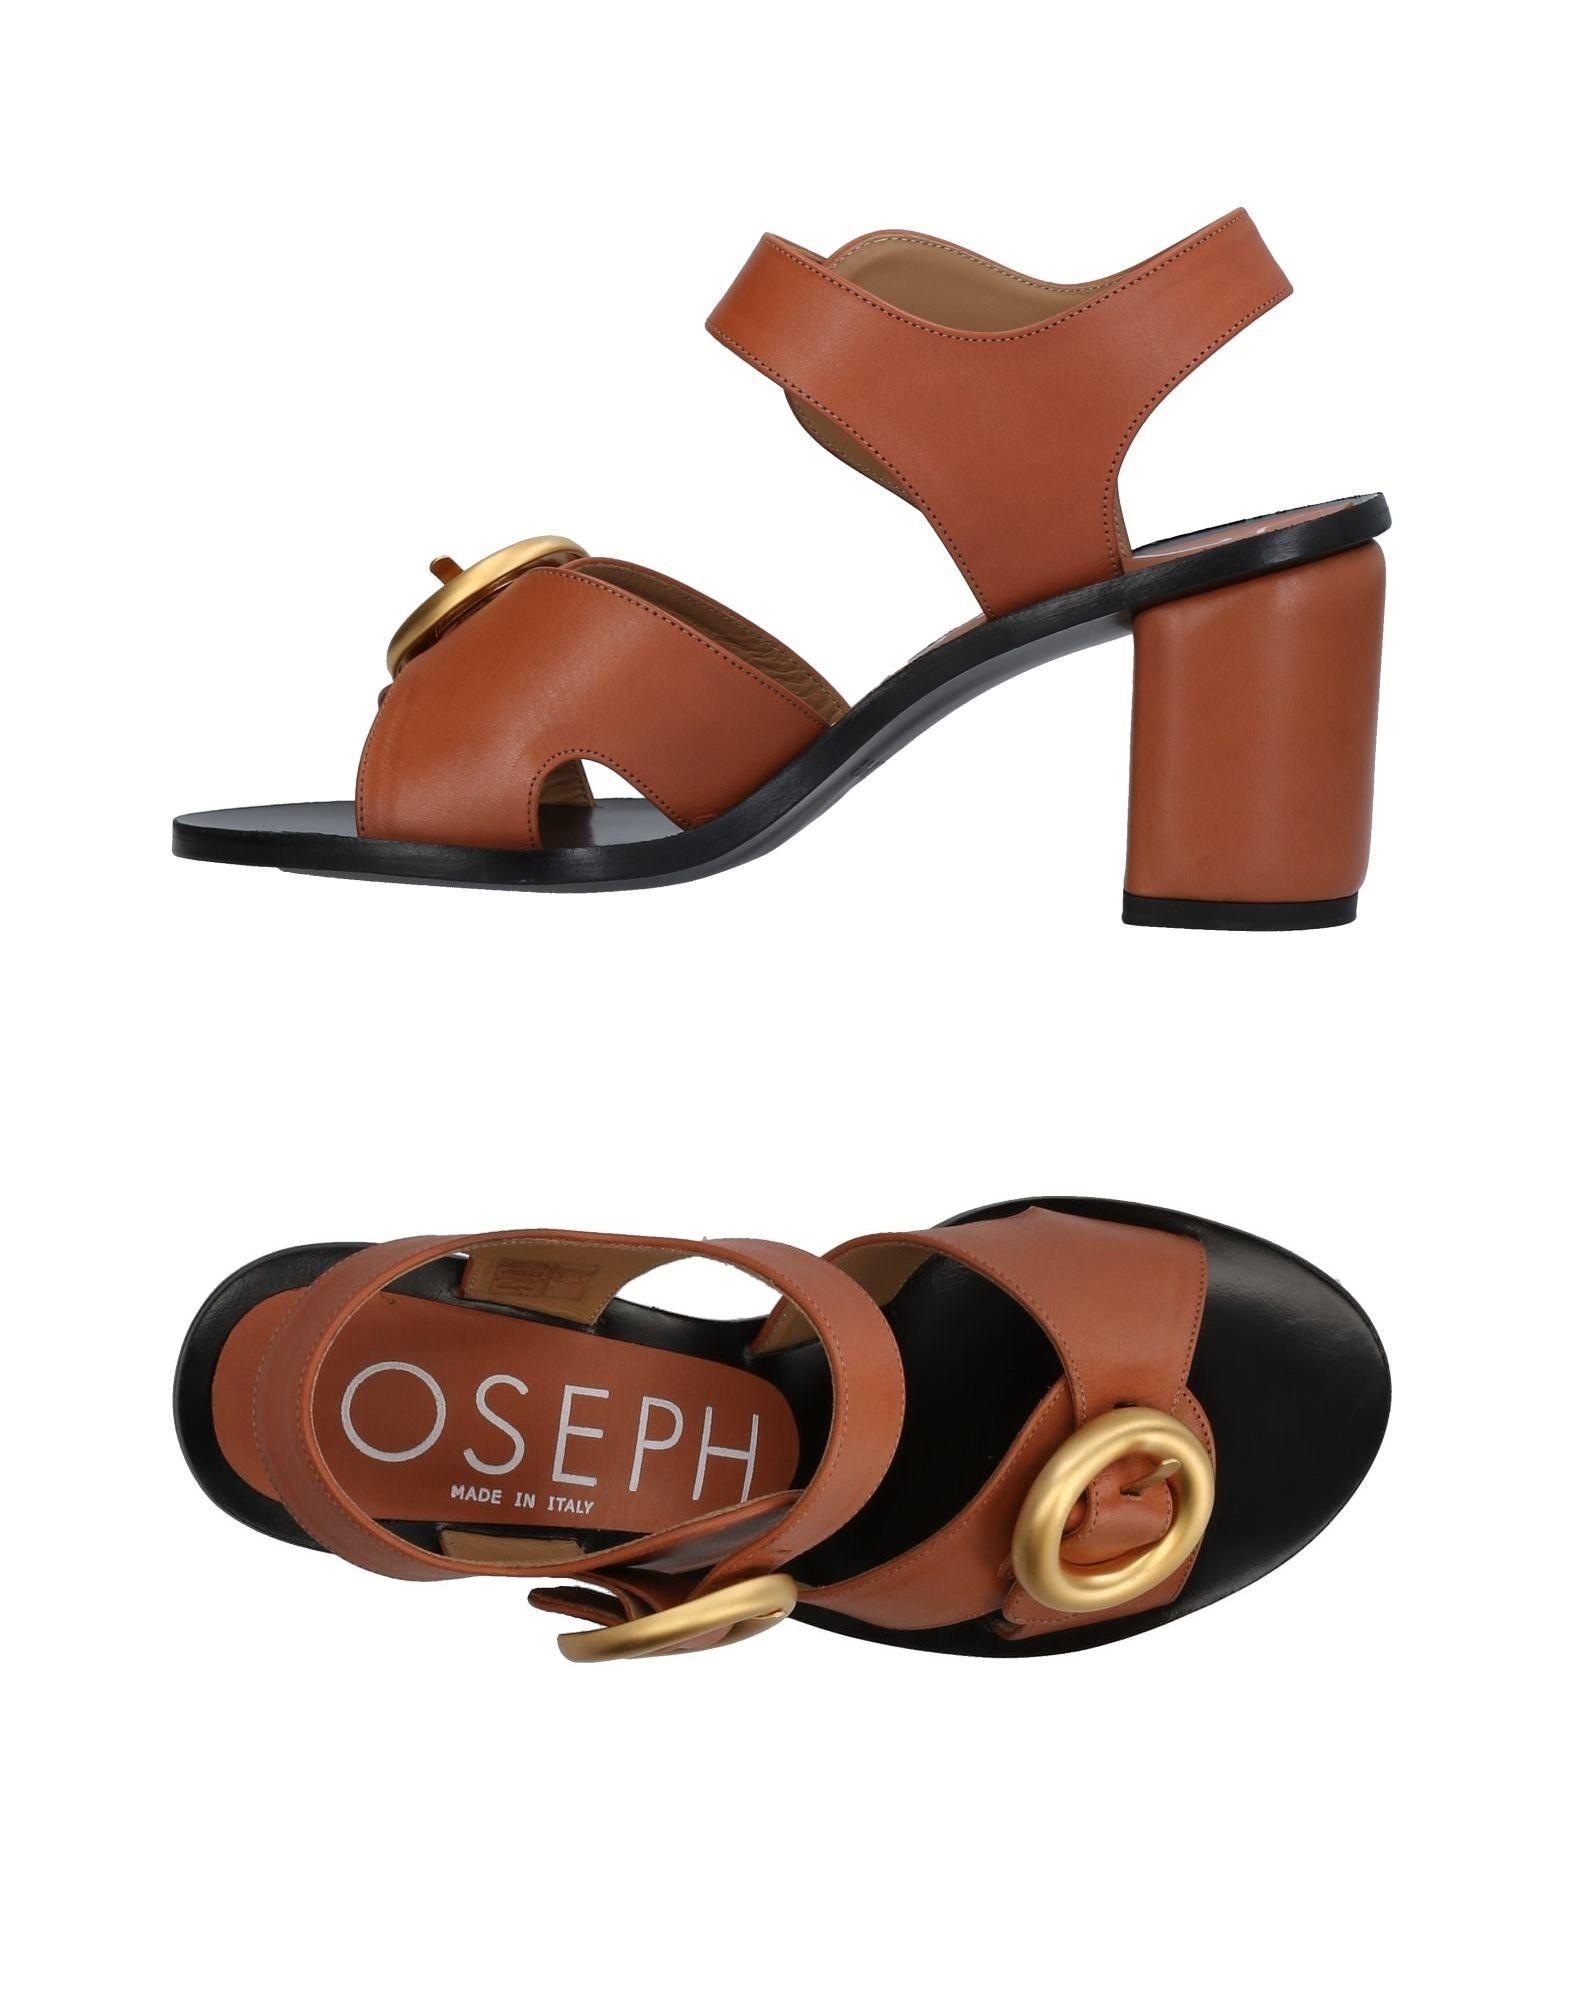 Joseph Sandalen Damen  11424730WTGut aussehende strapazierfähige Schuhe